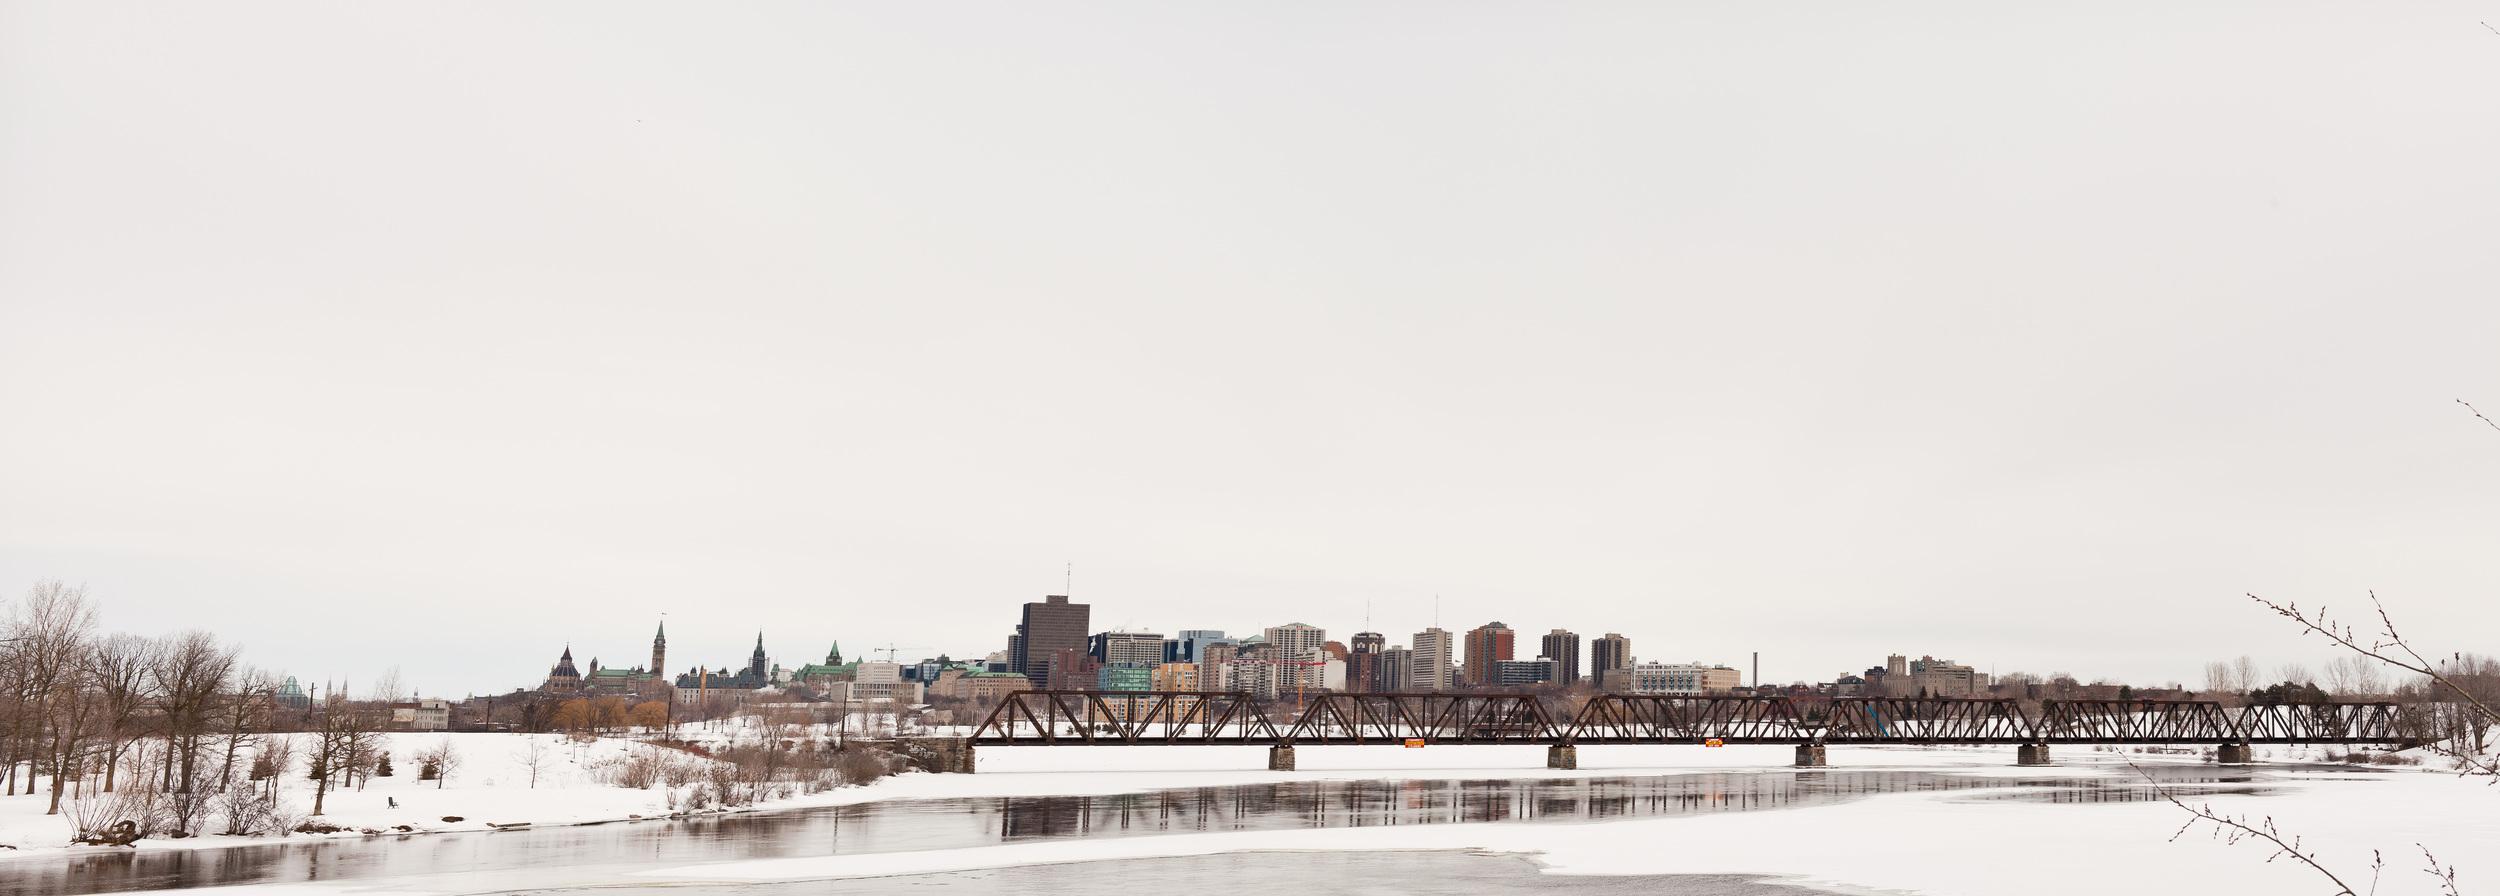 Jonathan_Kuhn_Photography_TrainTracks-.JPG